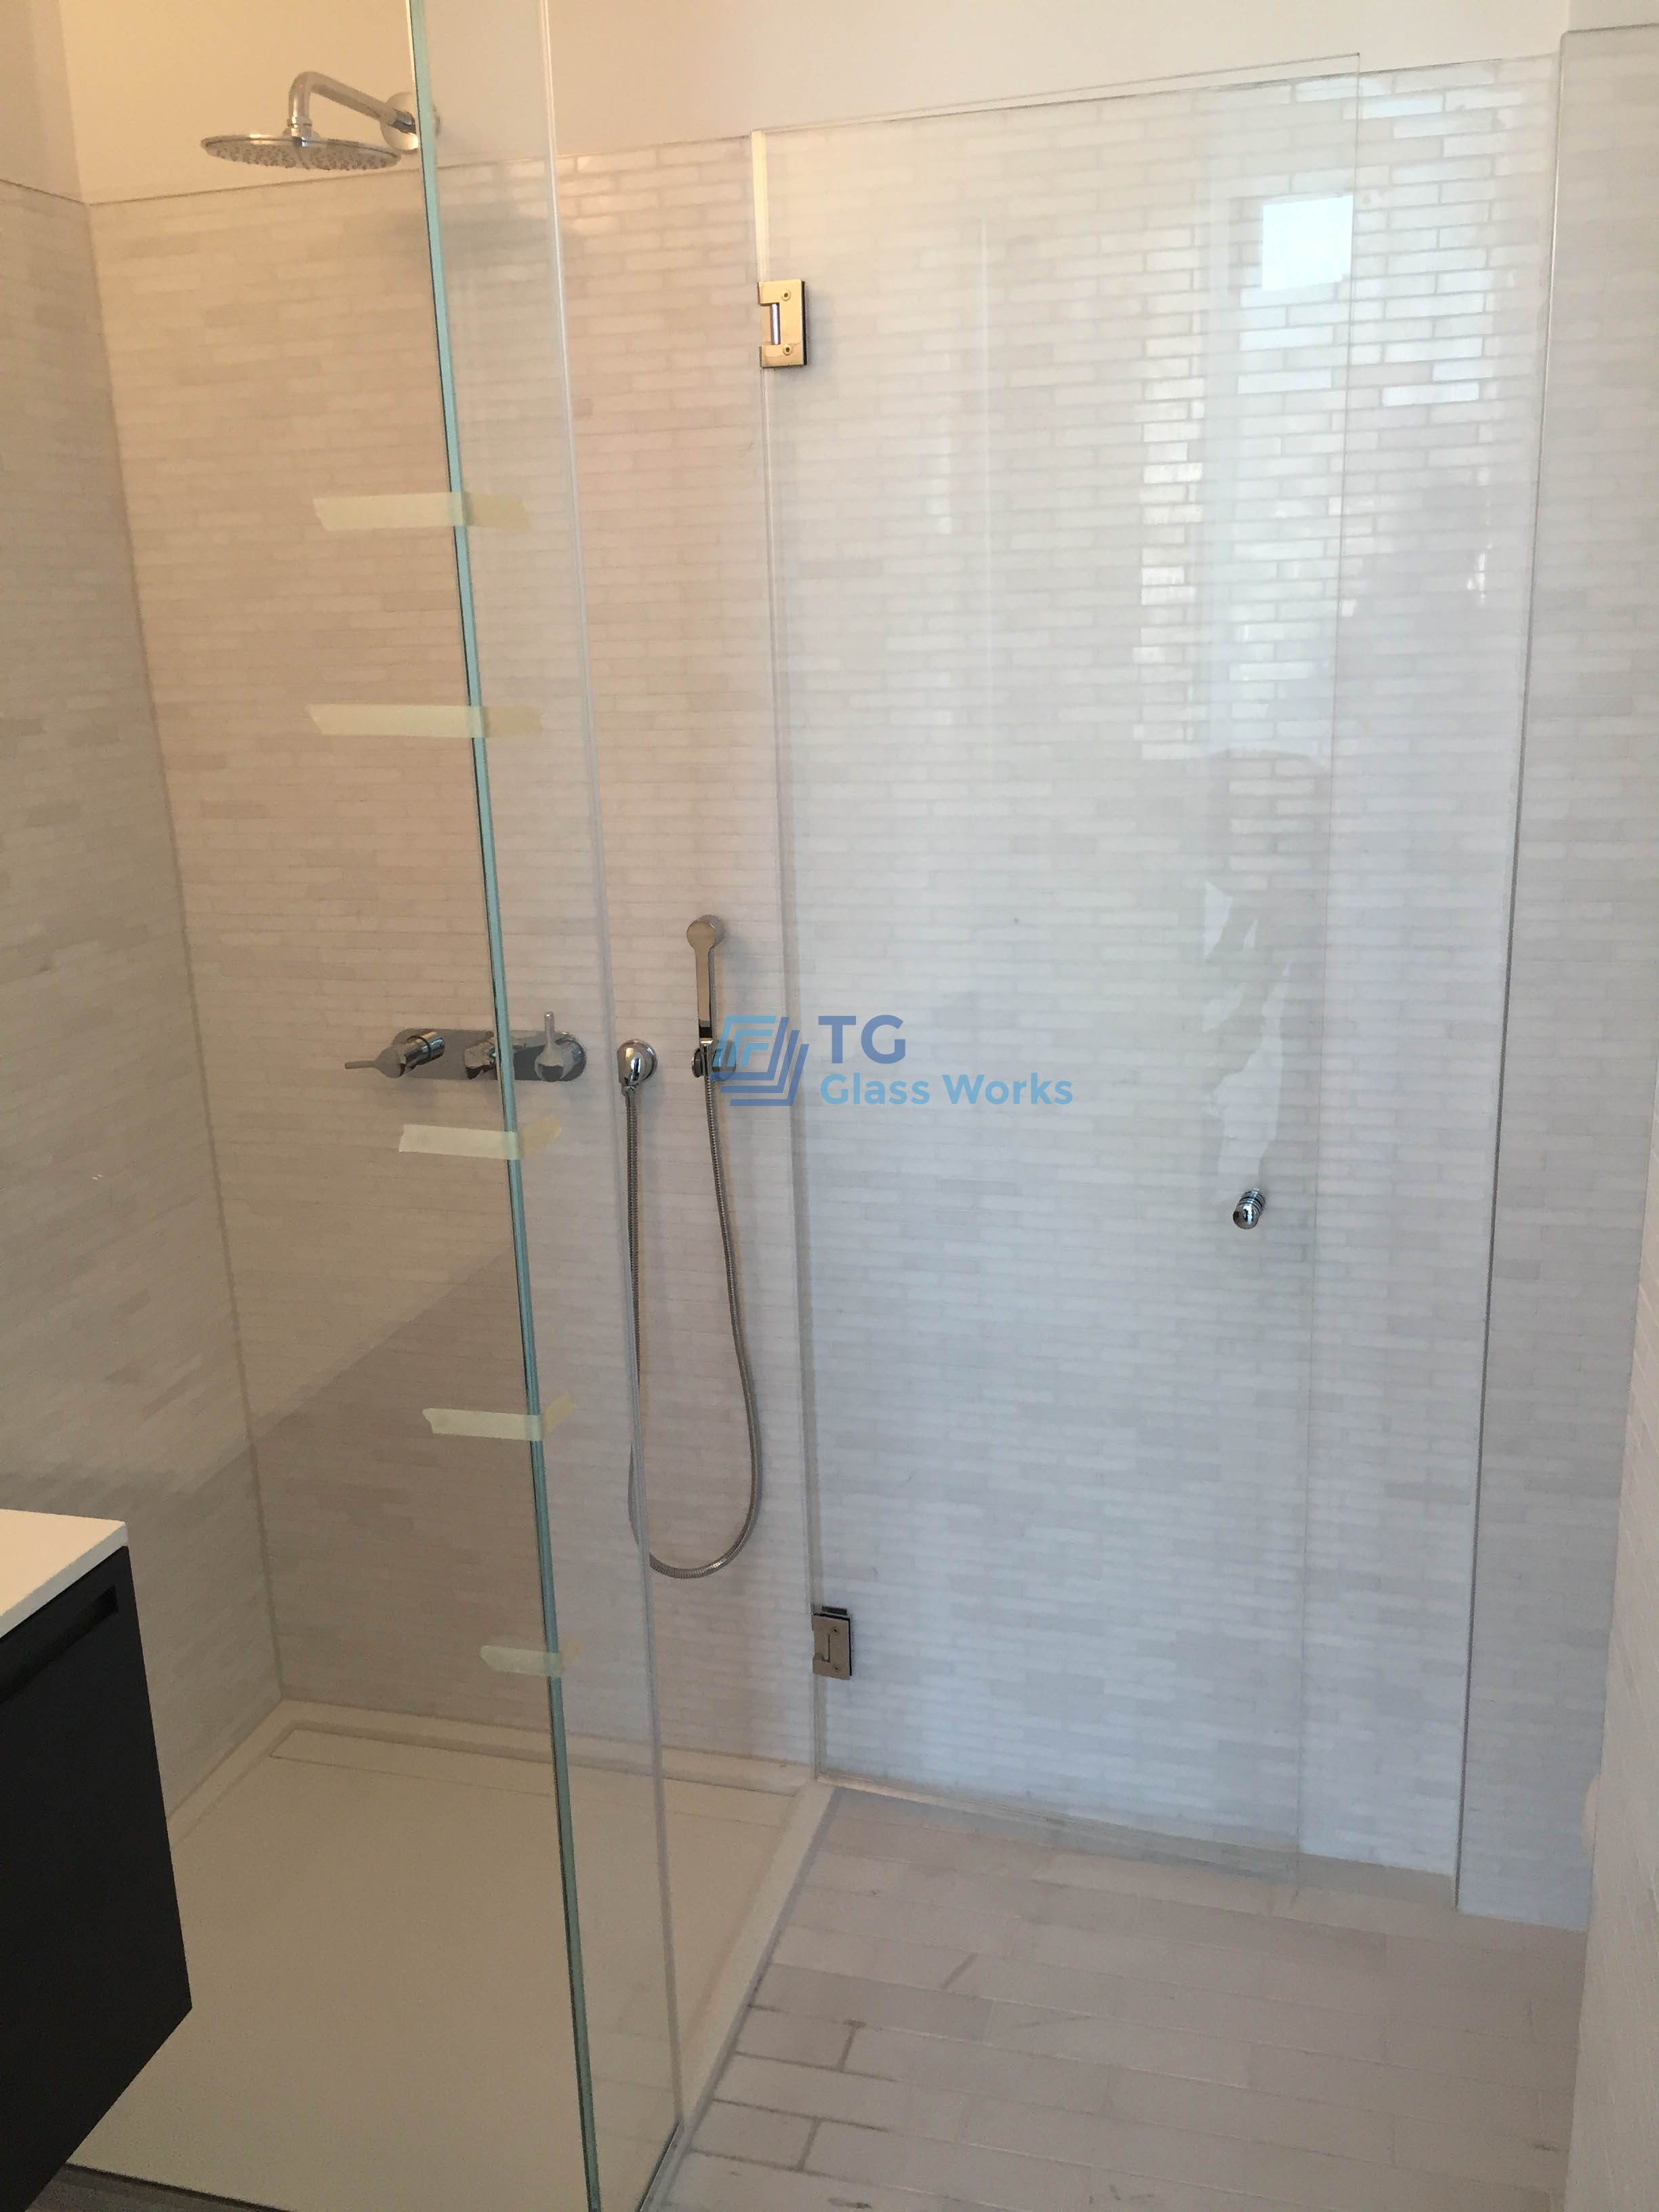 Barrier Free Glass Shower Door Tg Glass Works